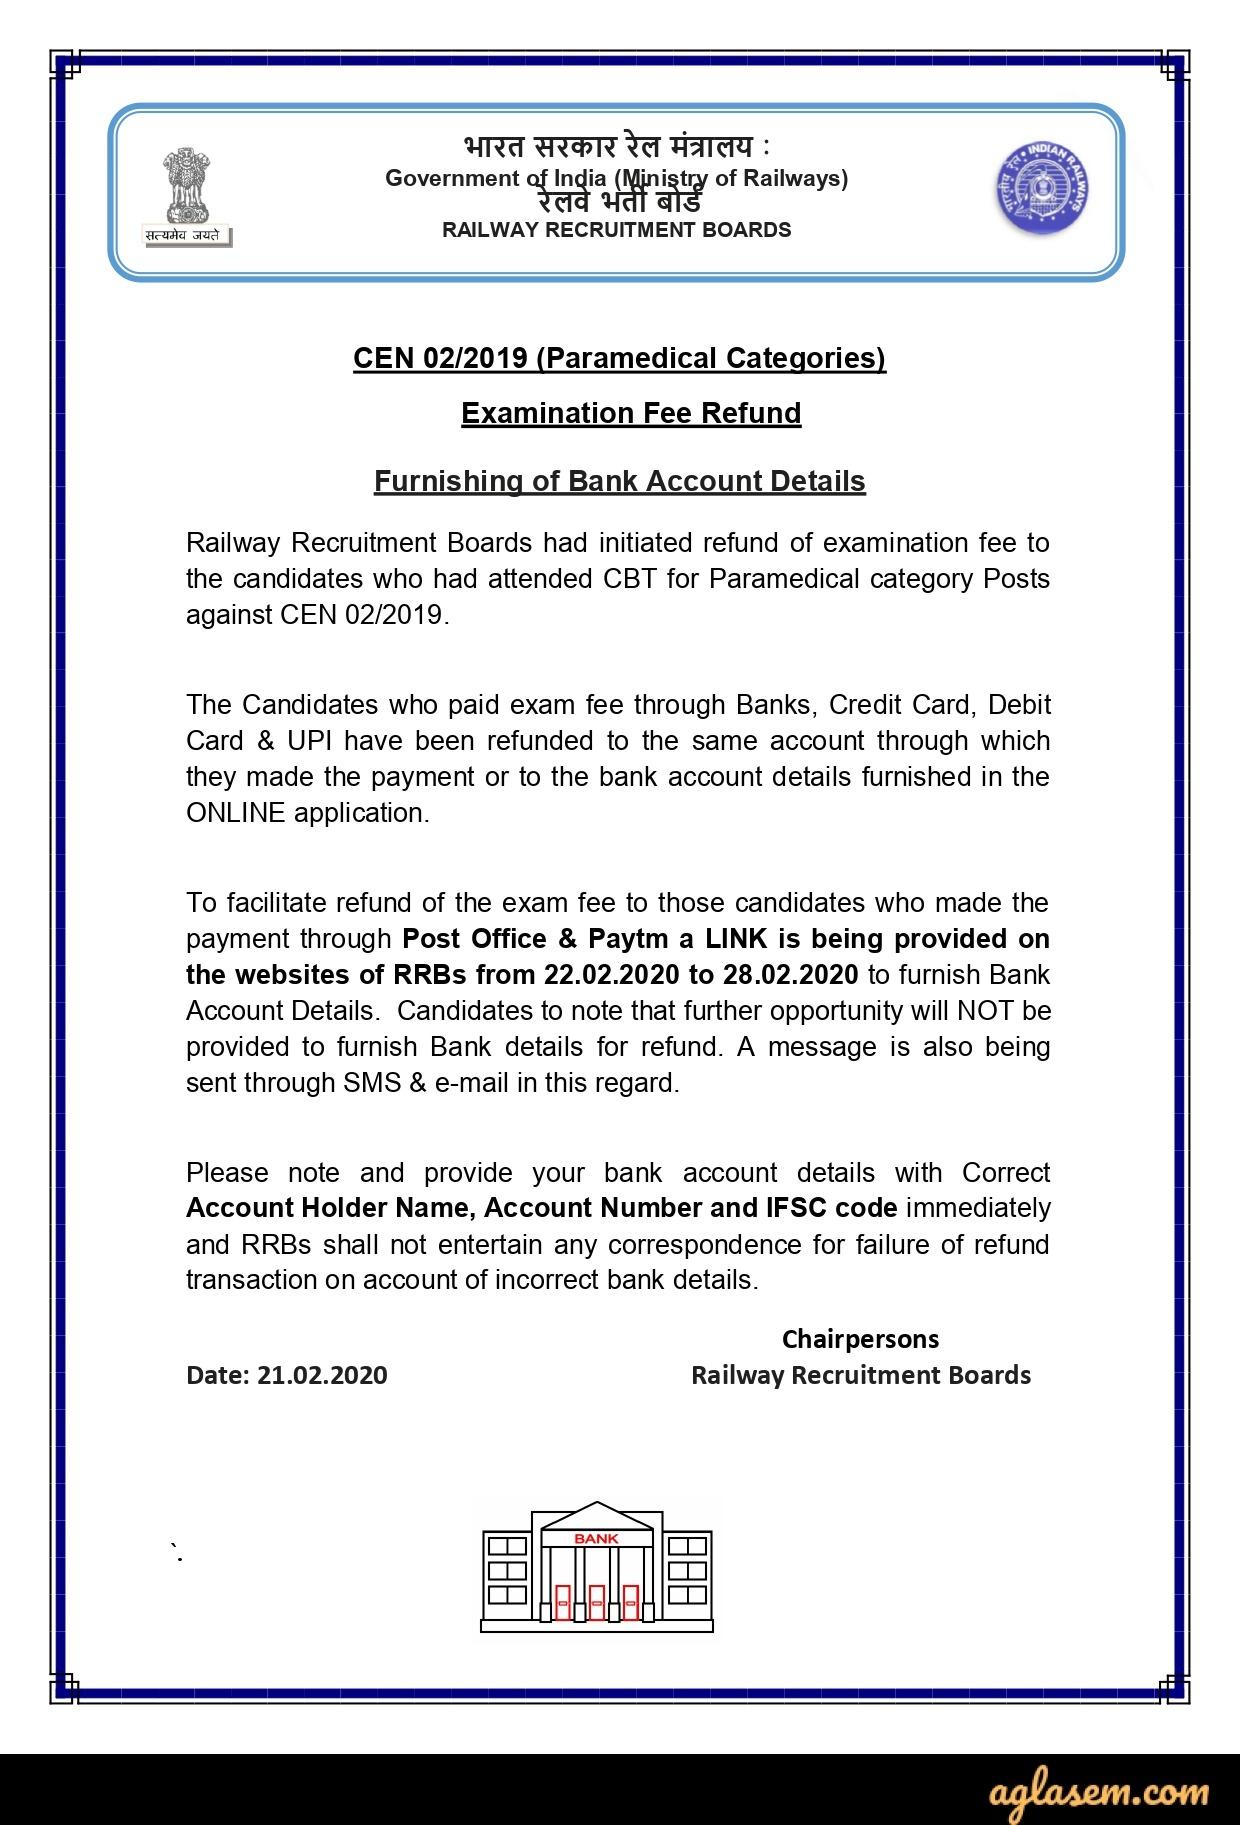 RRB Paramedical Fee Refund Notice